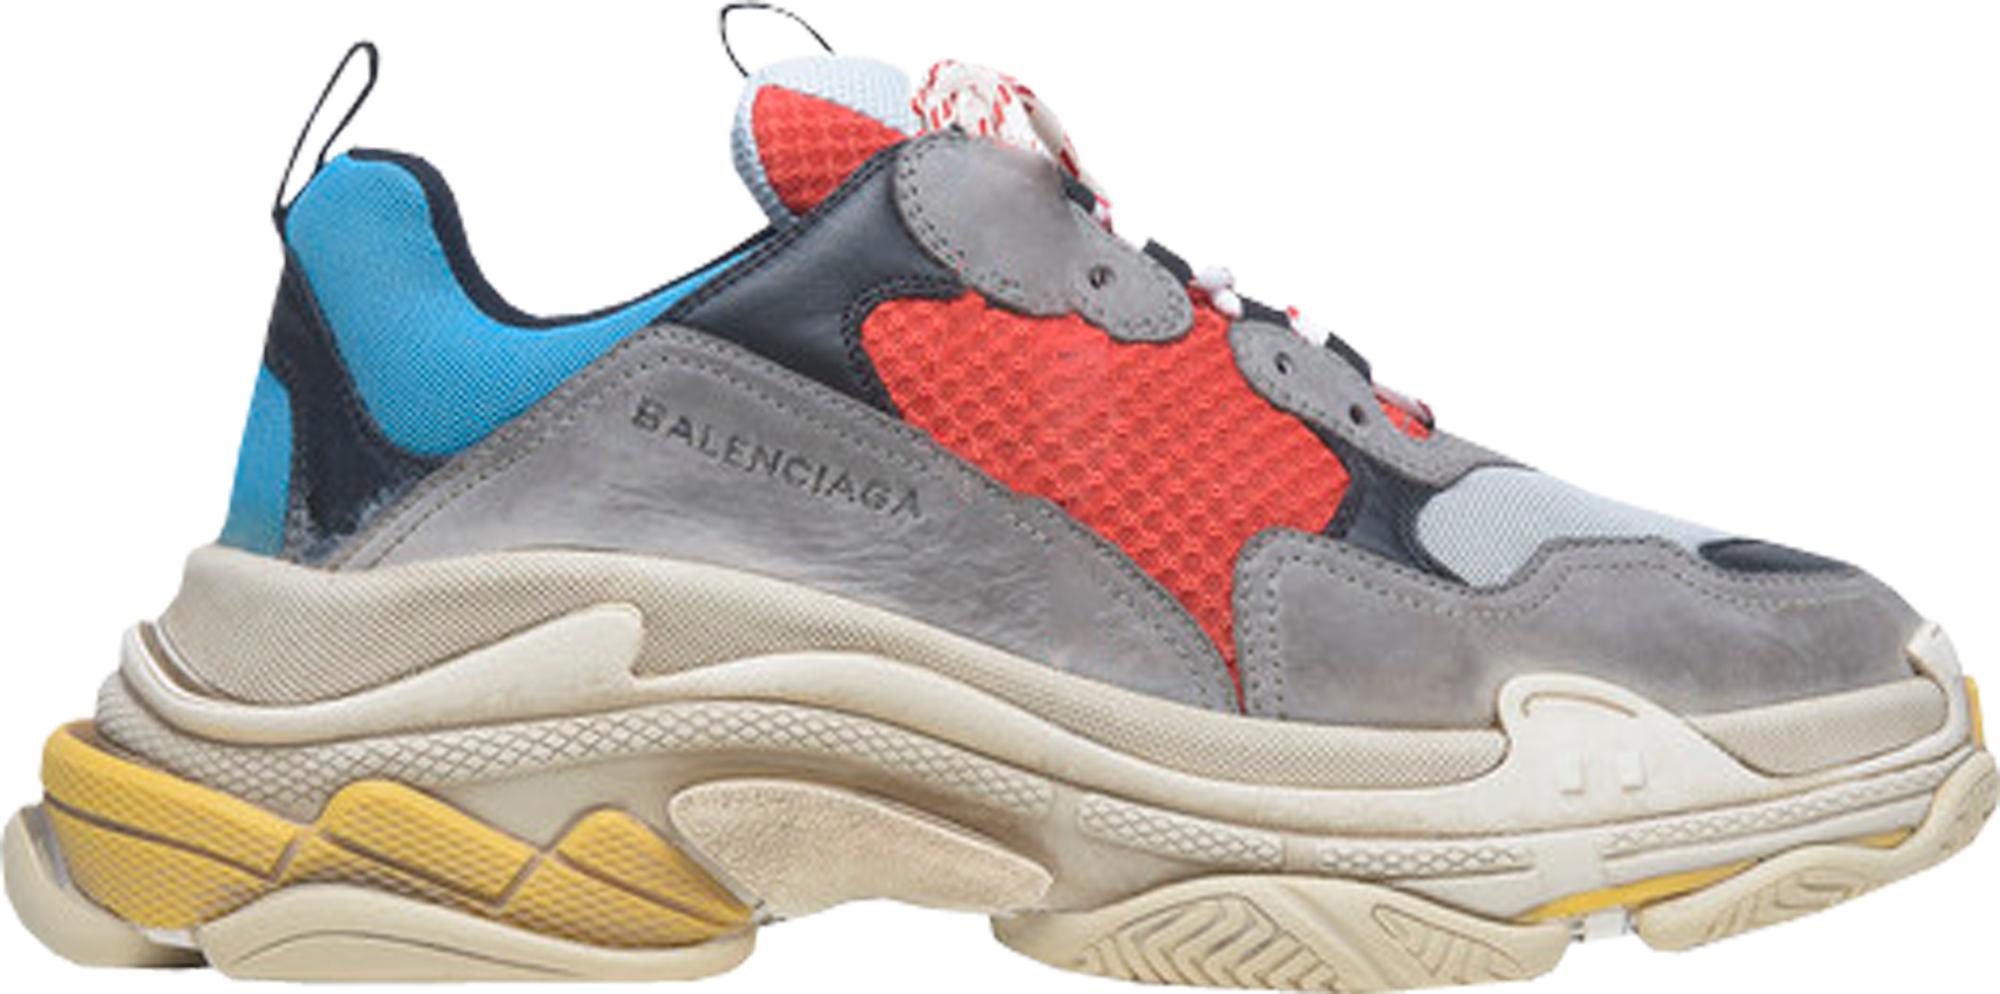 NEW BALENCiAGA TRiPLE S Pink 38 Trainer Sneaker